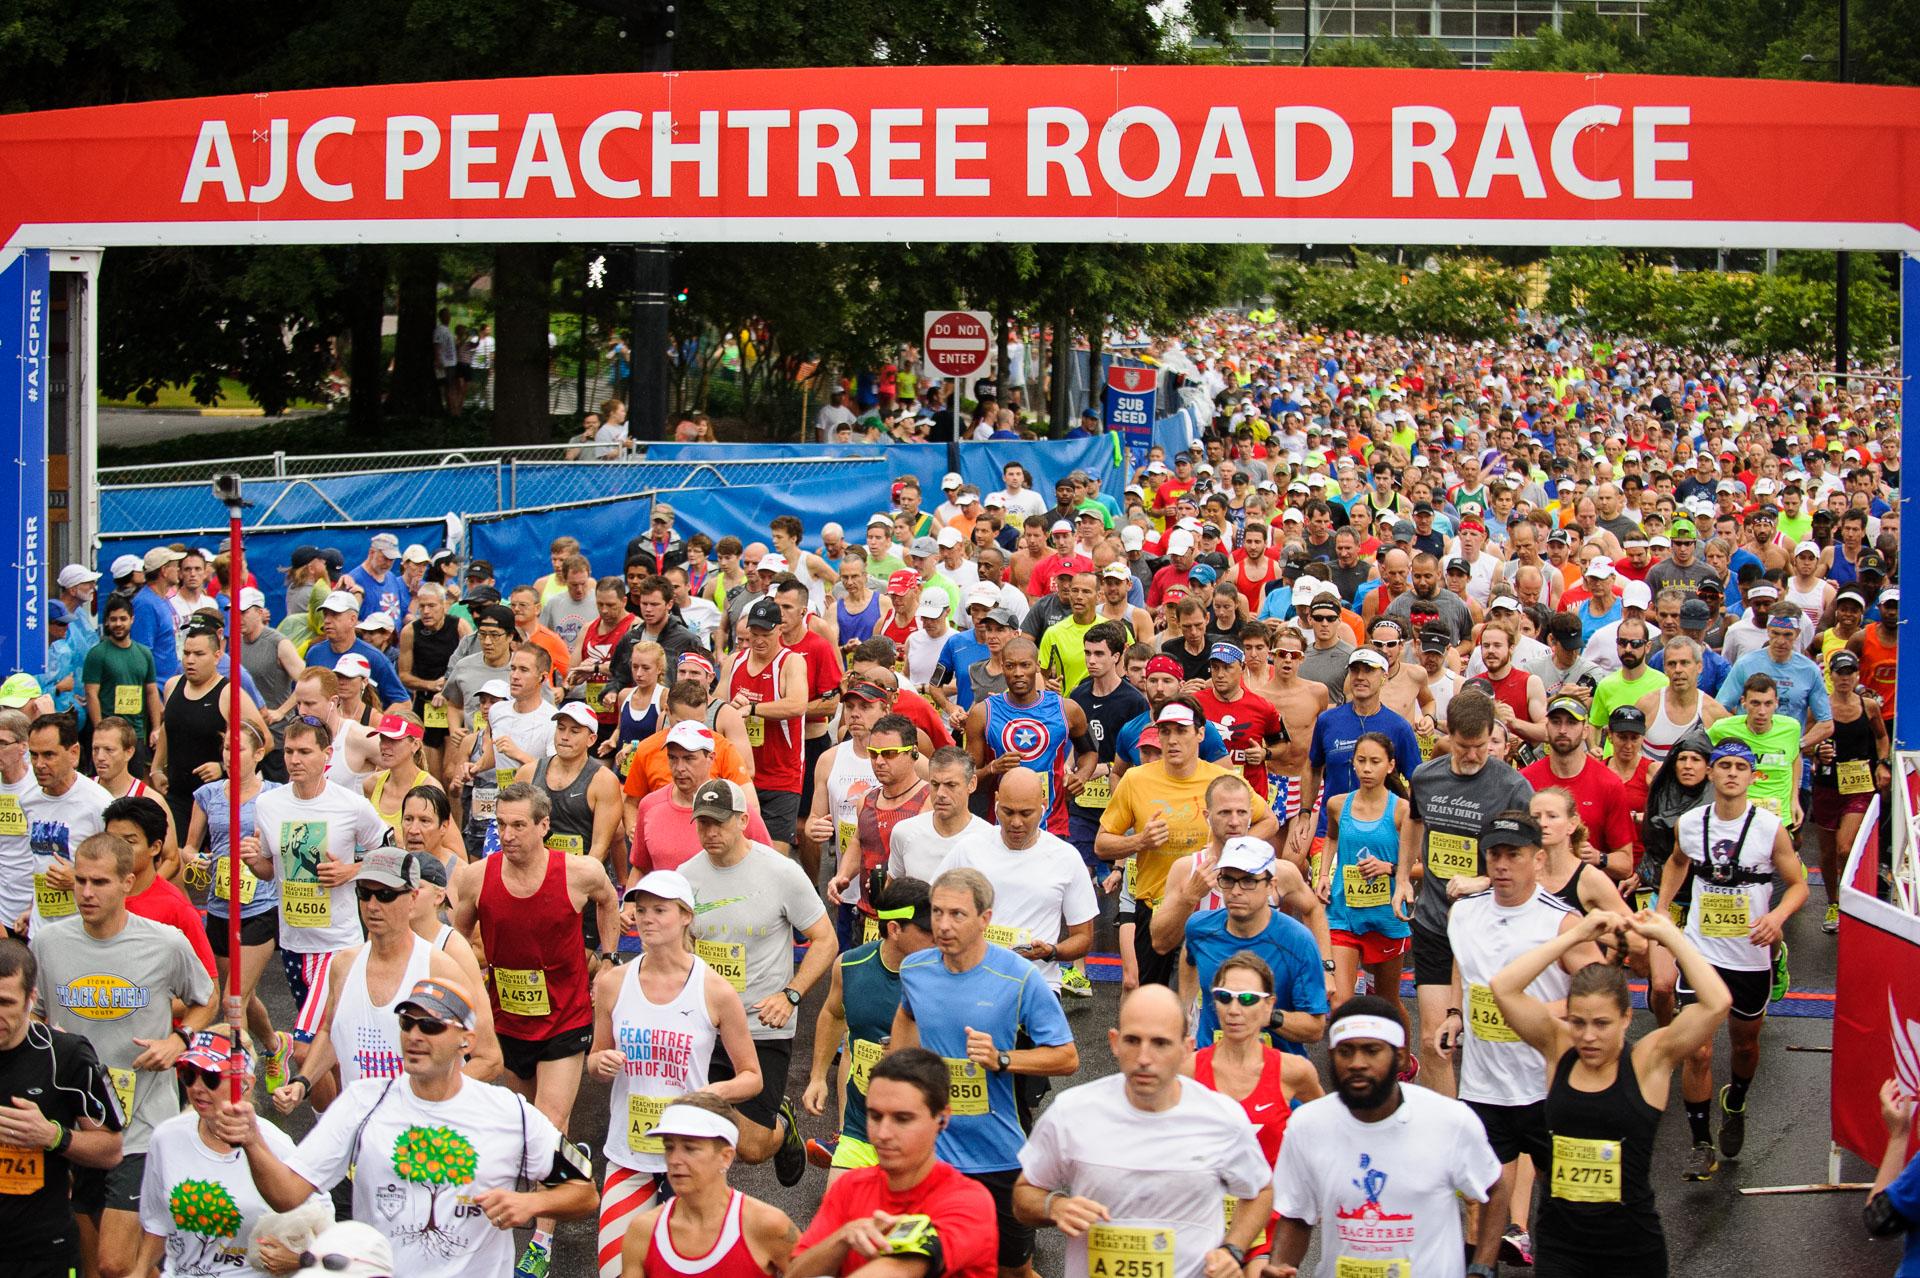 2016 ajc peachtree road race wwwajccom for The peachtree